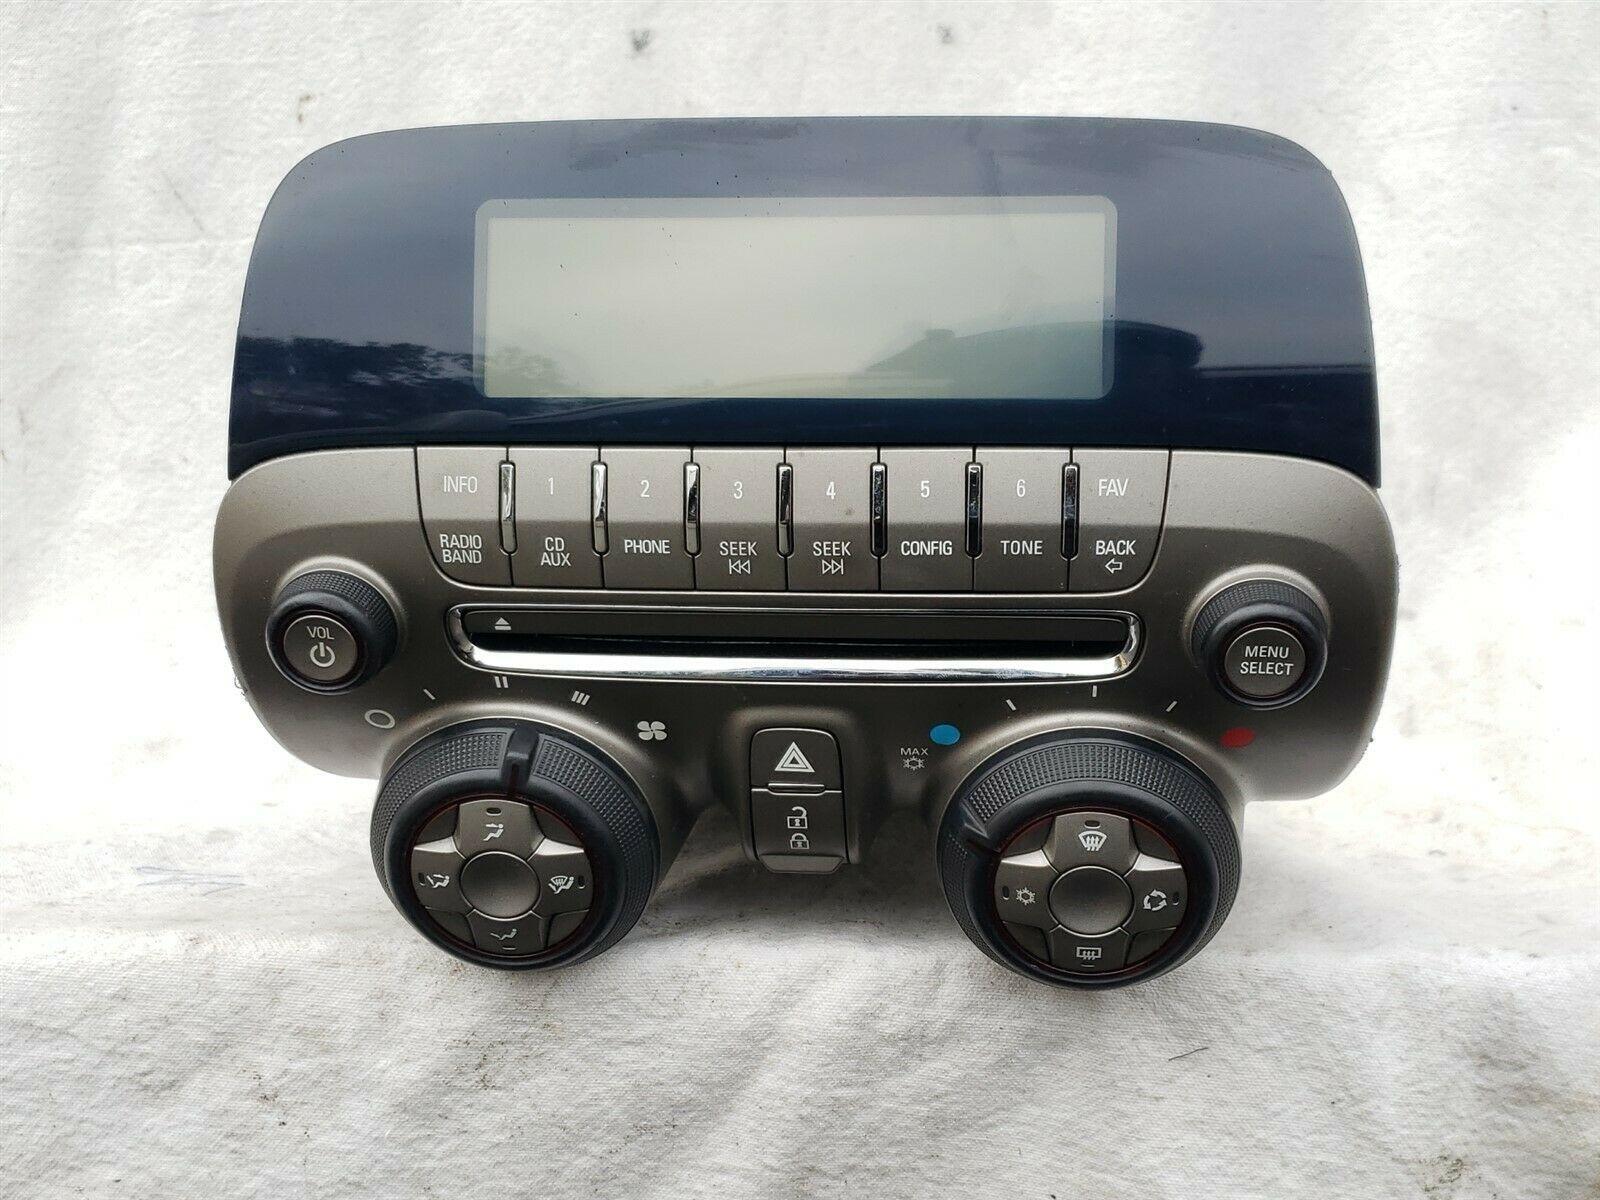 10-15 Camaro Radio OEM Climate Control AC Faceplate Display P/n 20990311